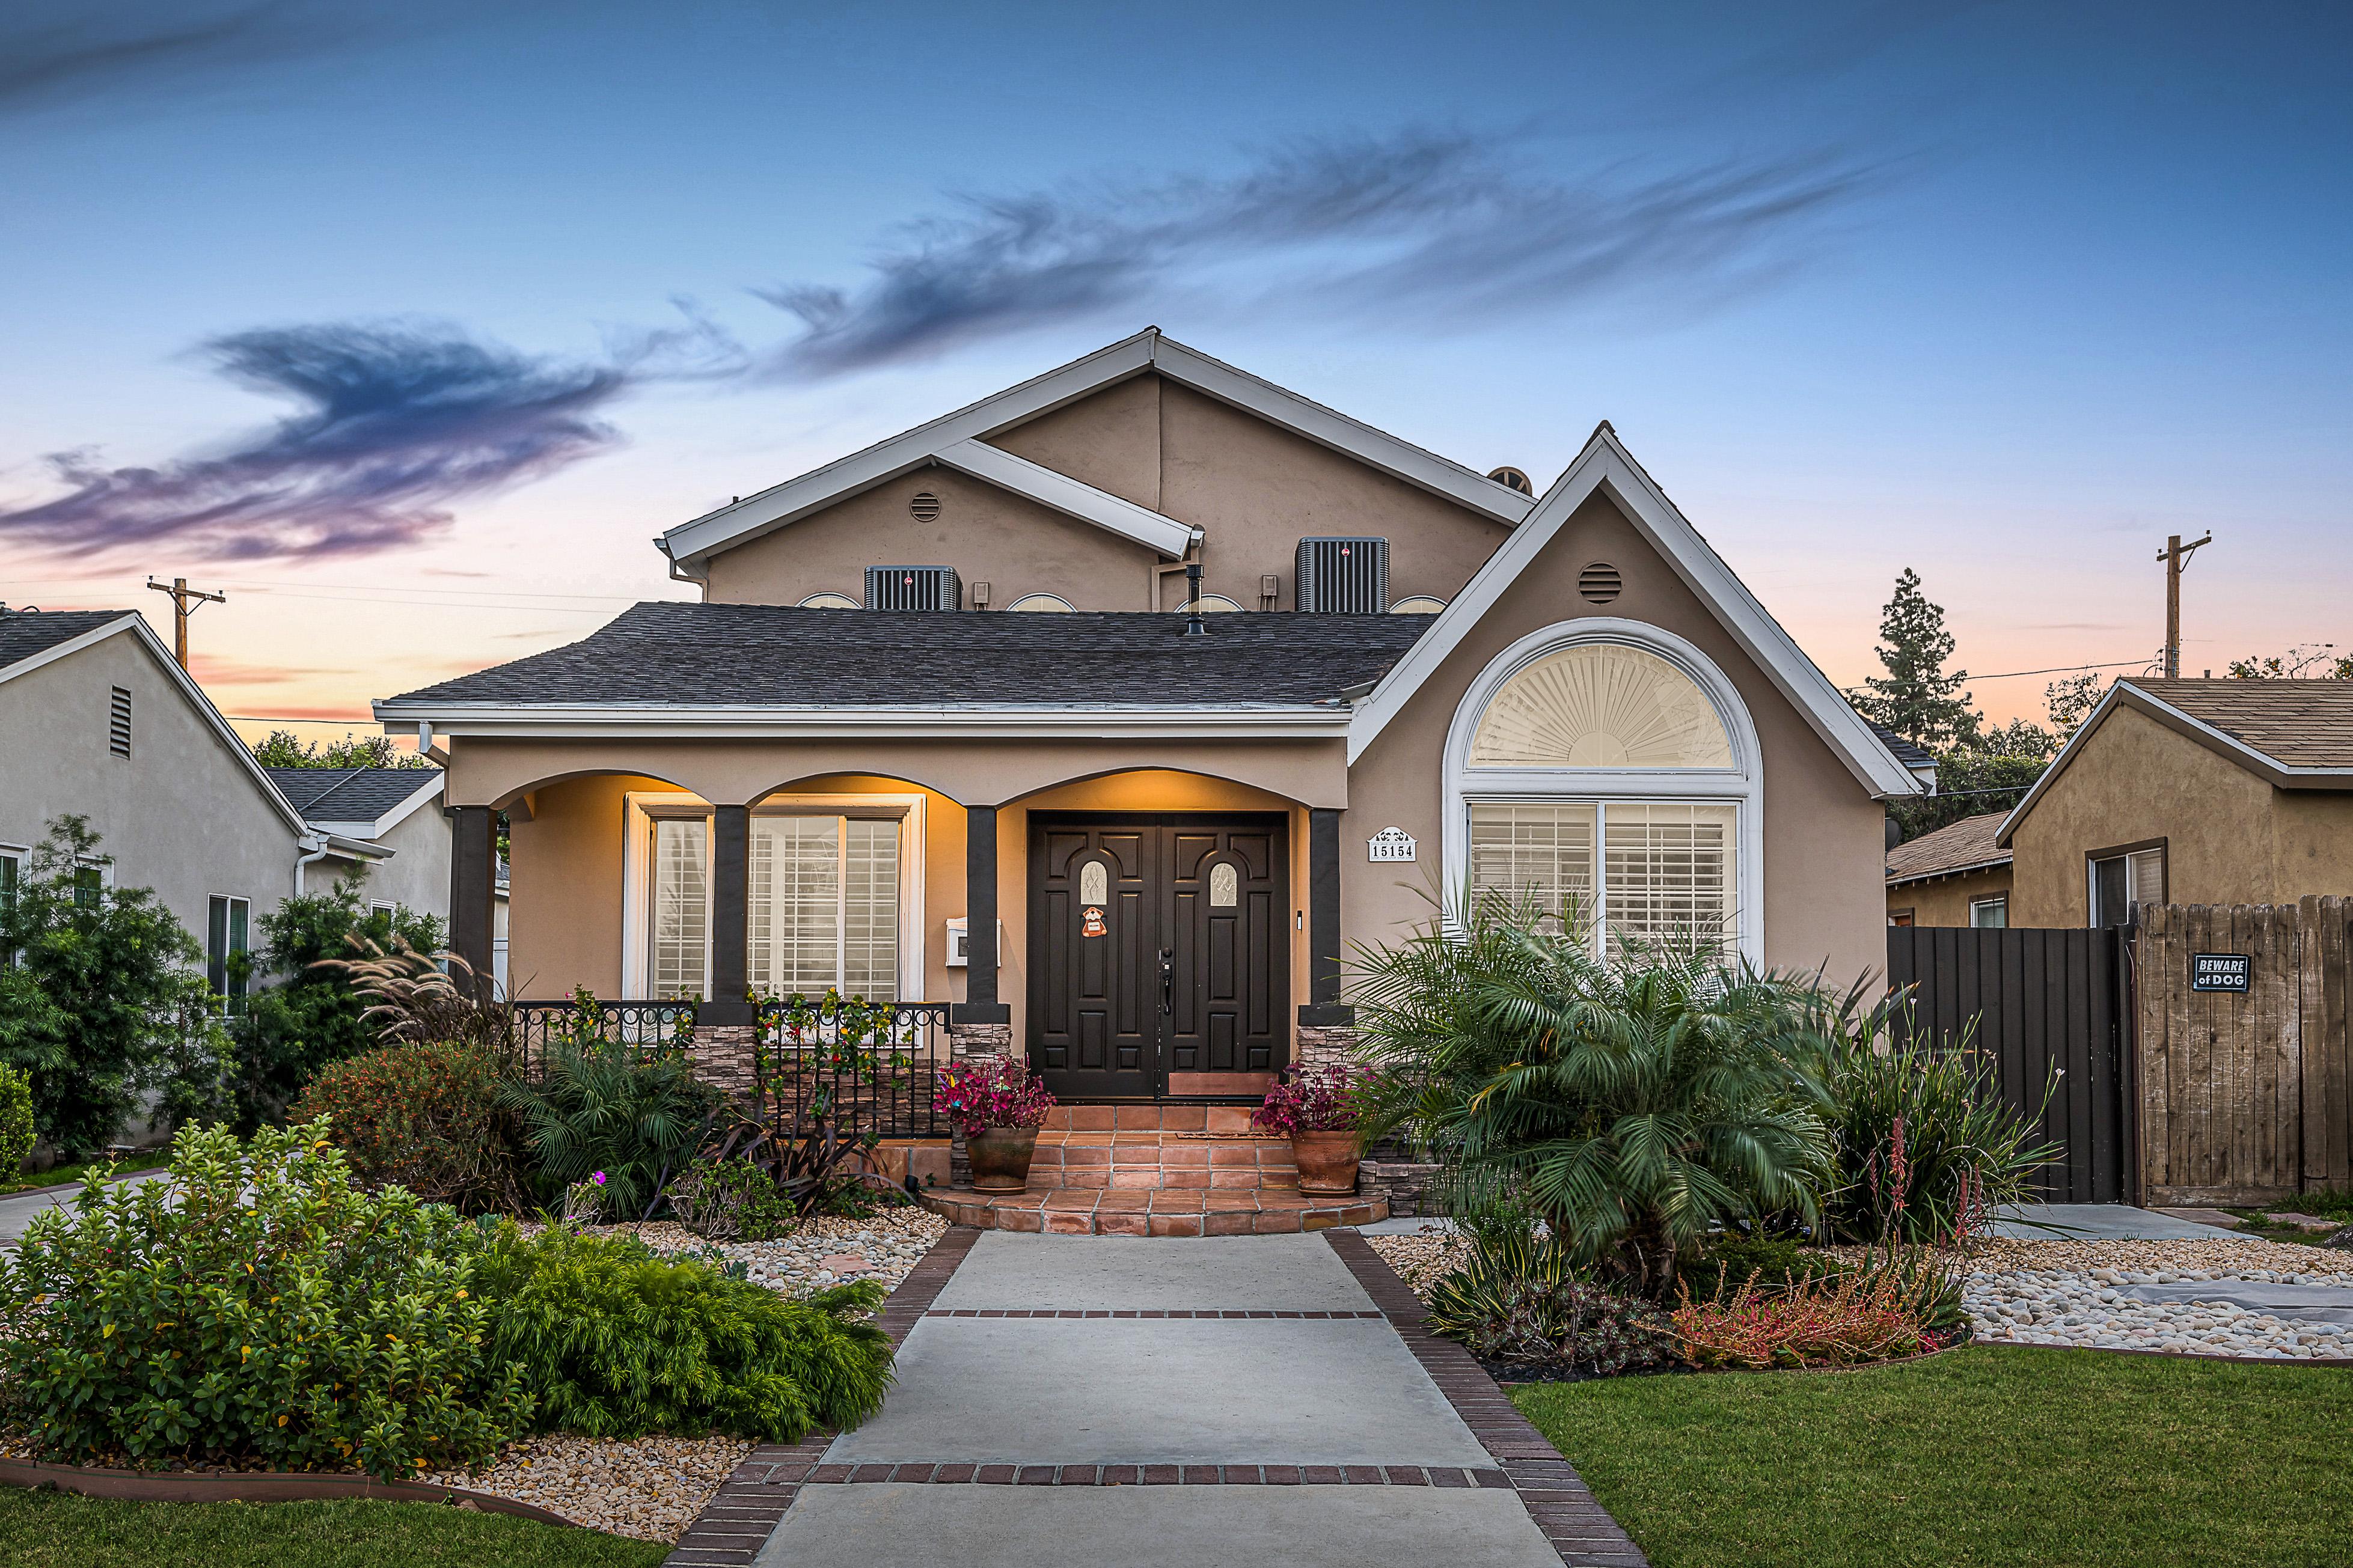 Perfect Home in Sherman Oaks